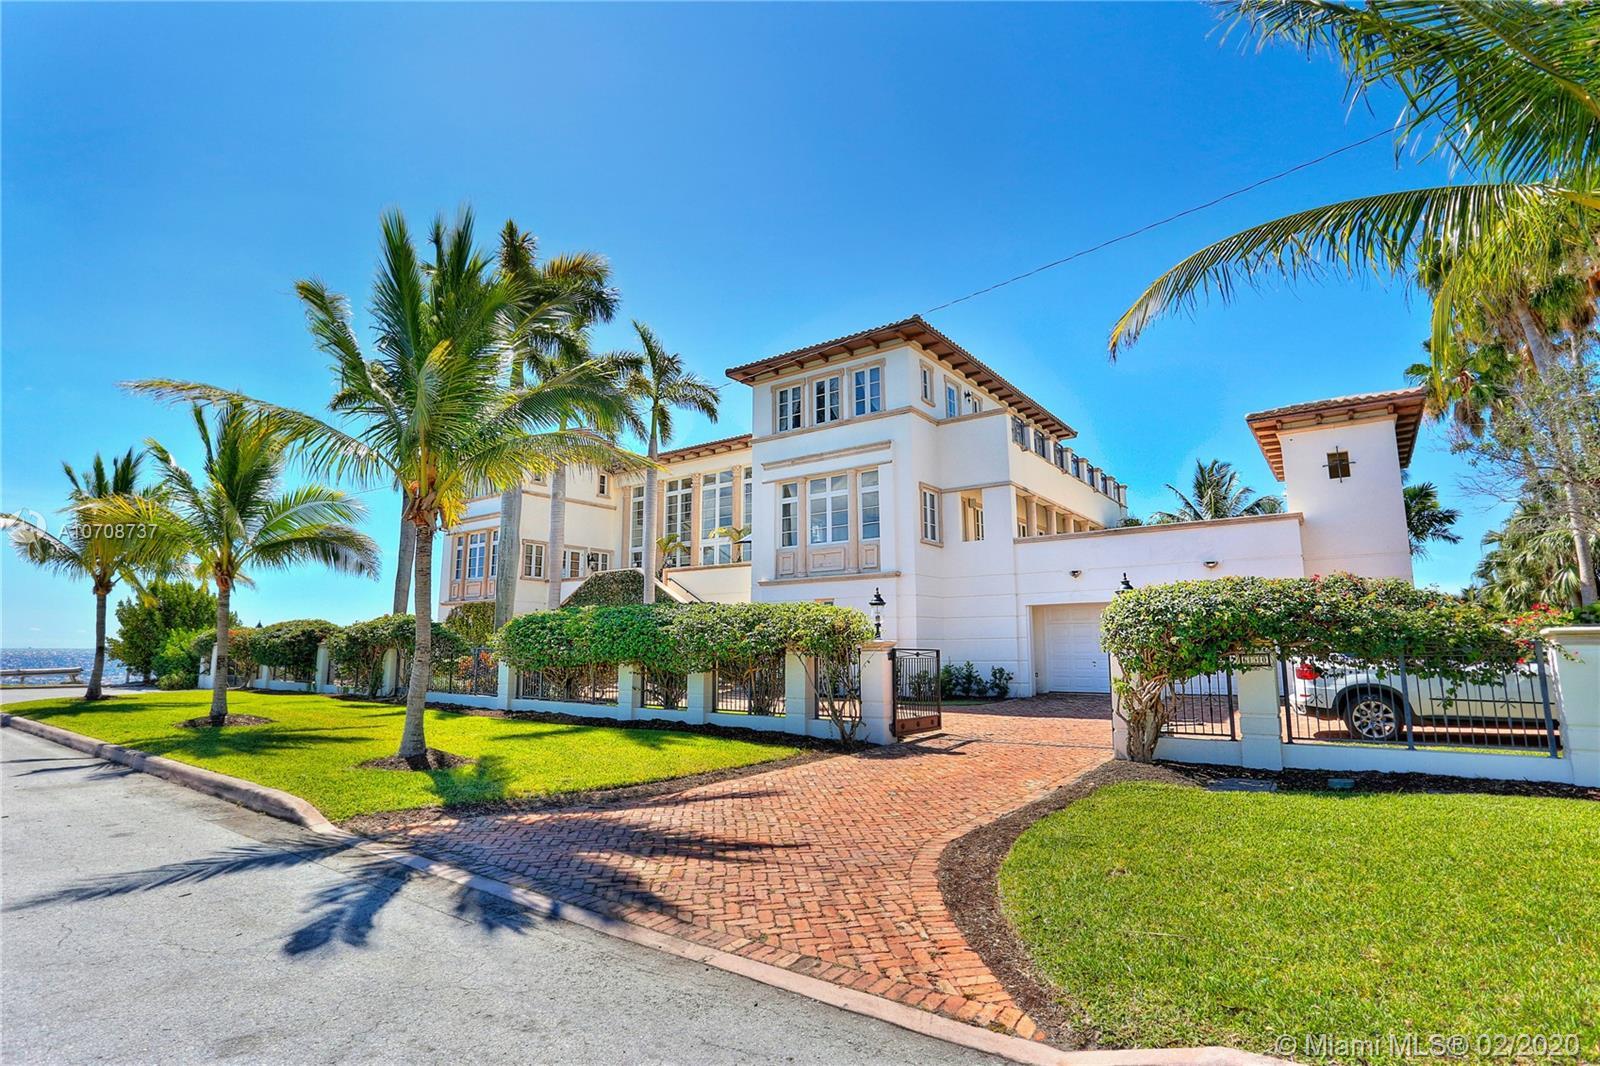 650 Lugo Ave, Kendall, Florida